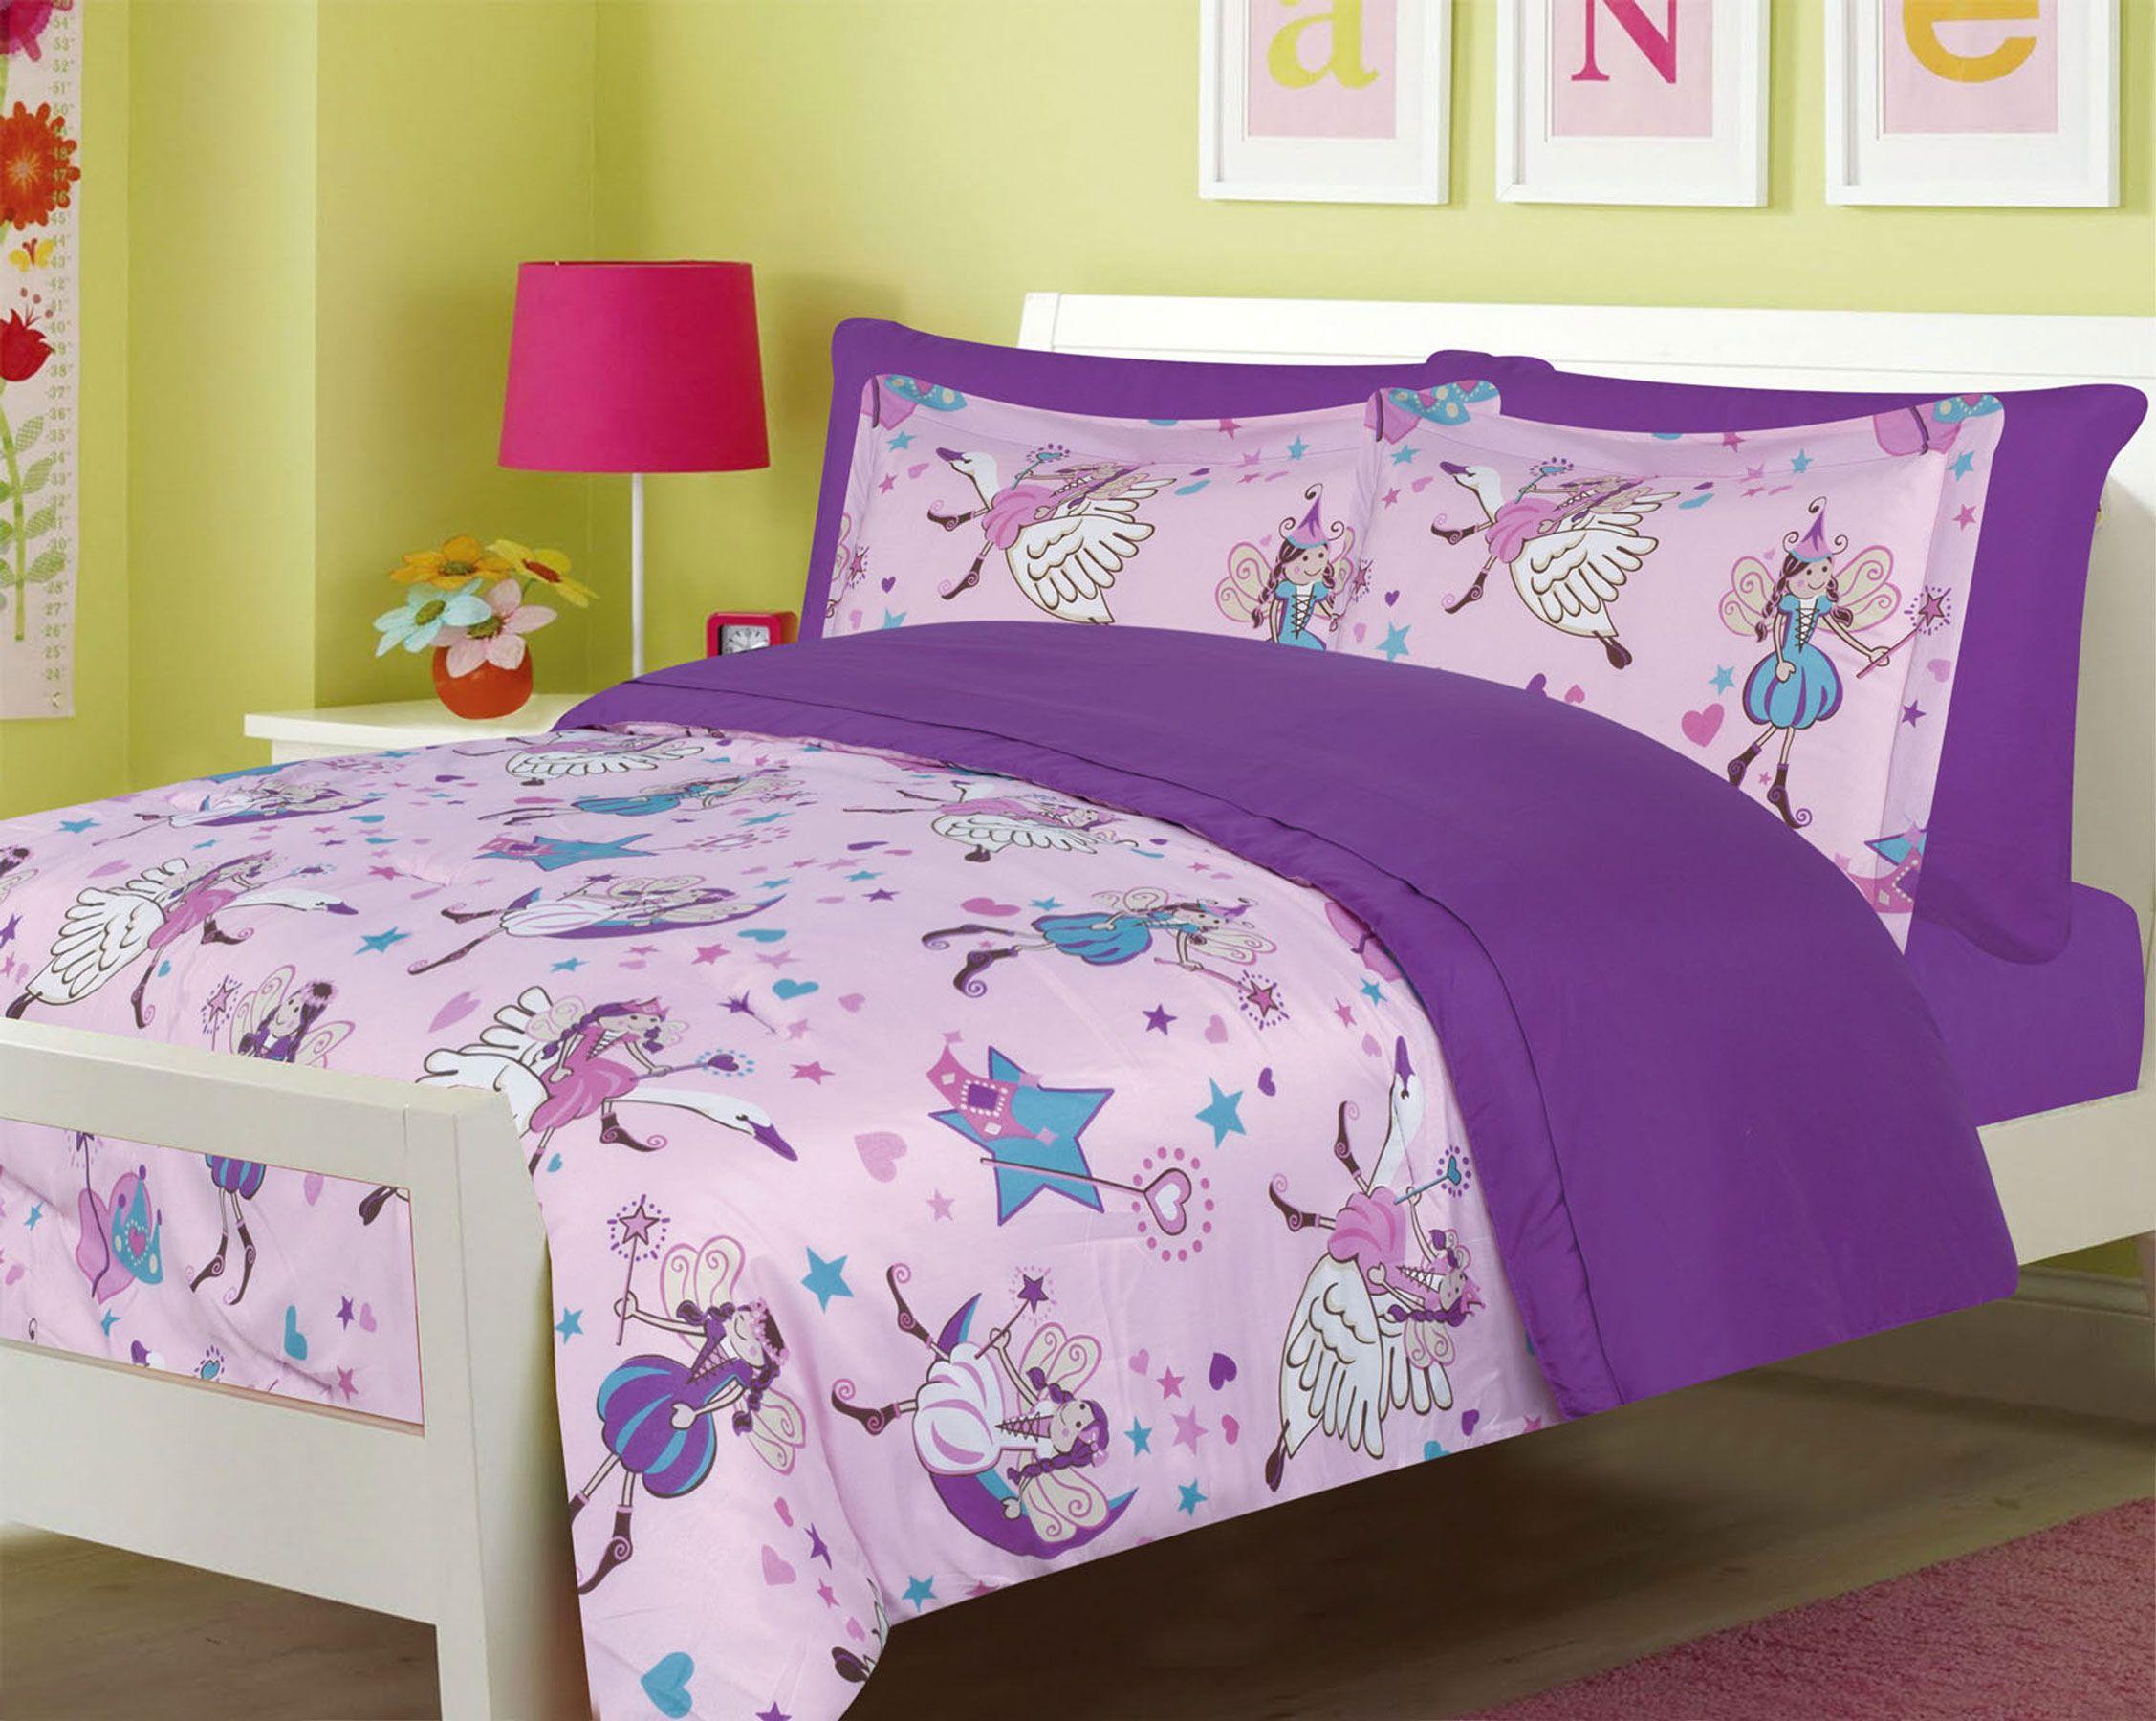 Girls bedding twin 5 pc fairy princess purple comforter